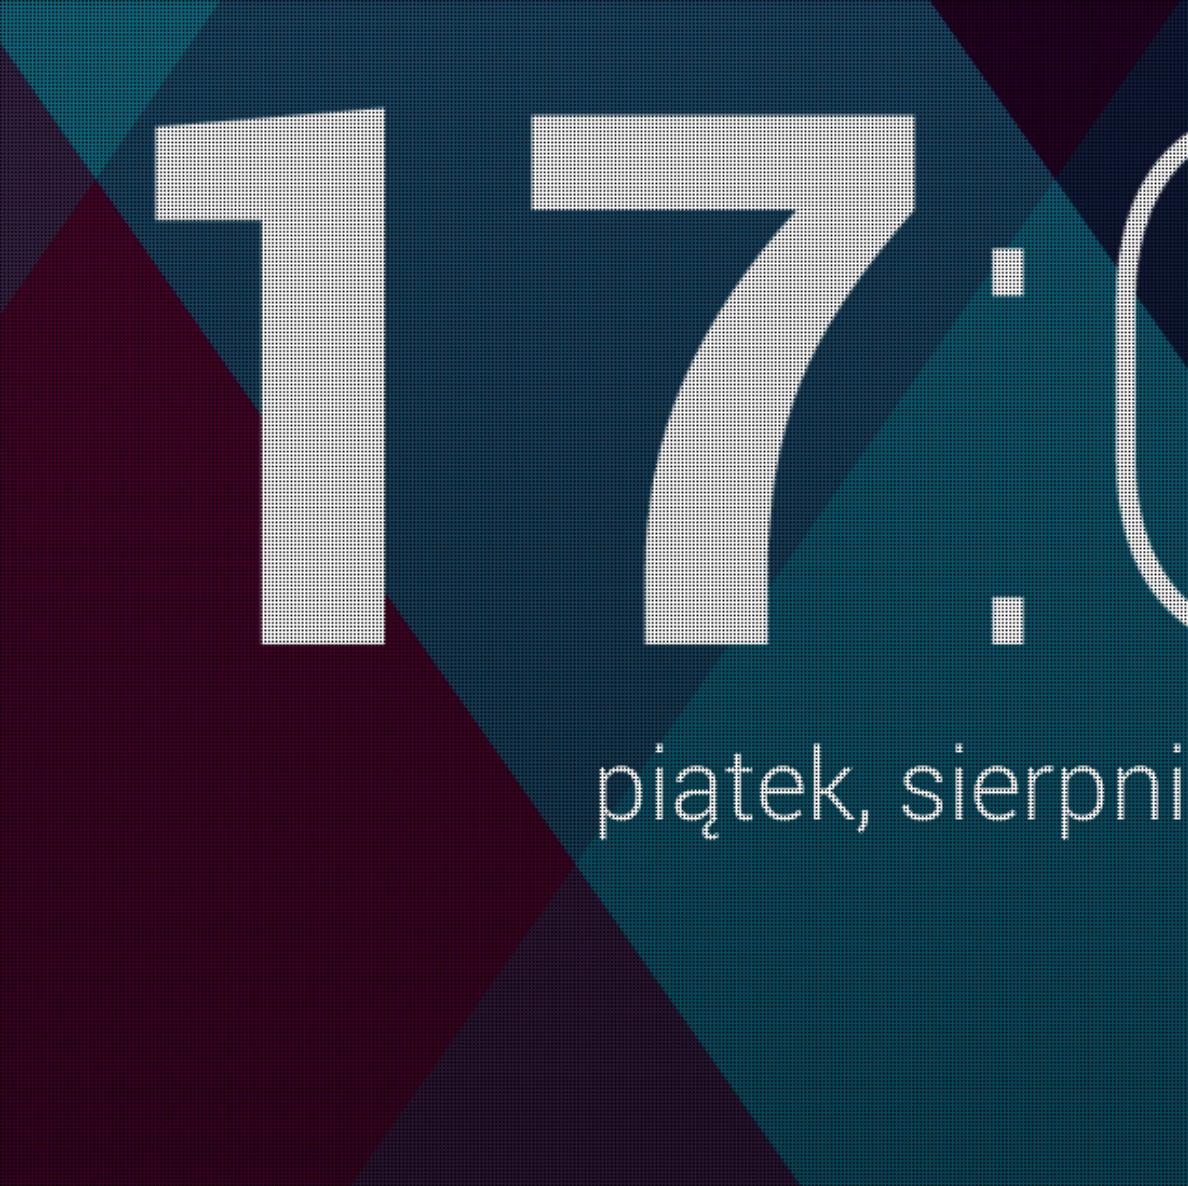 2014-12-30 05.23.24 pm